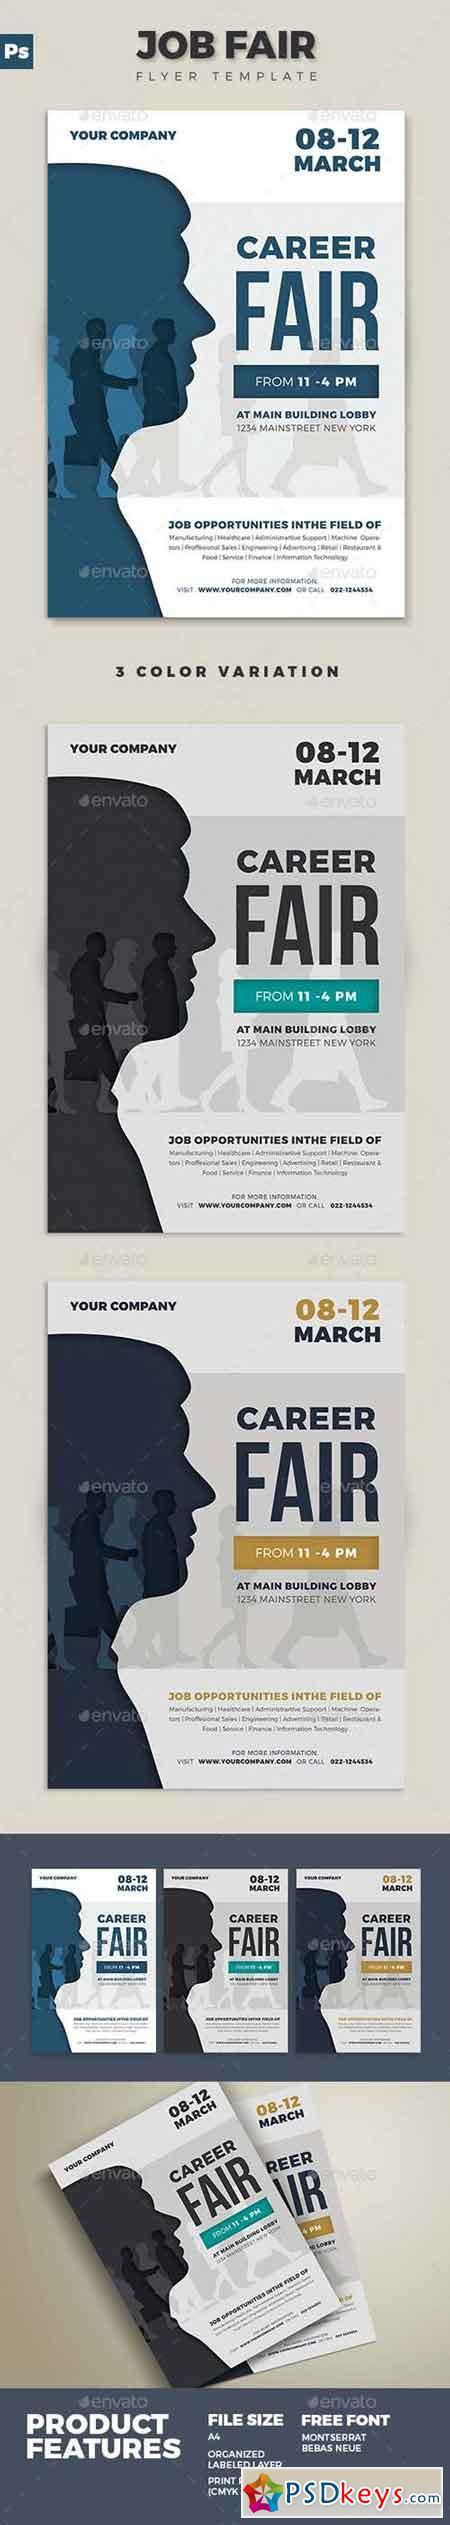 Job Fair Flyer 02 19531605